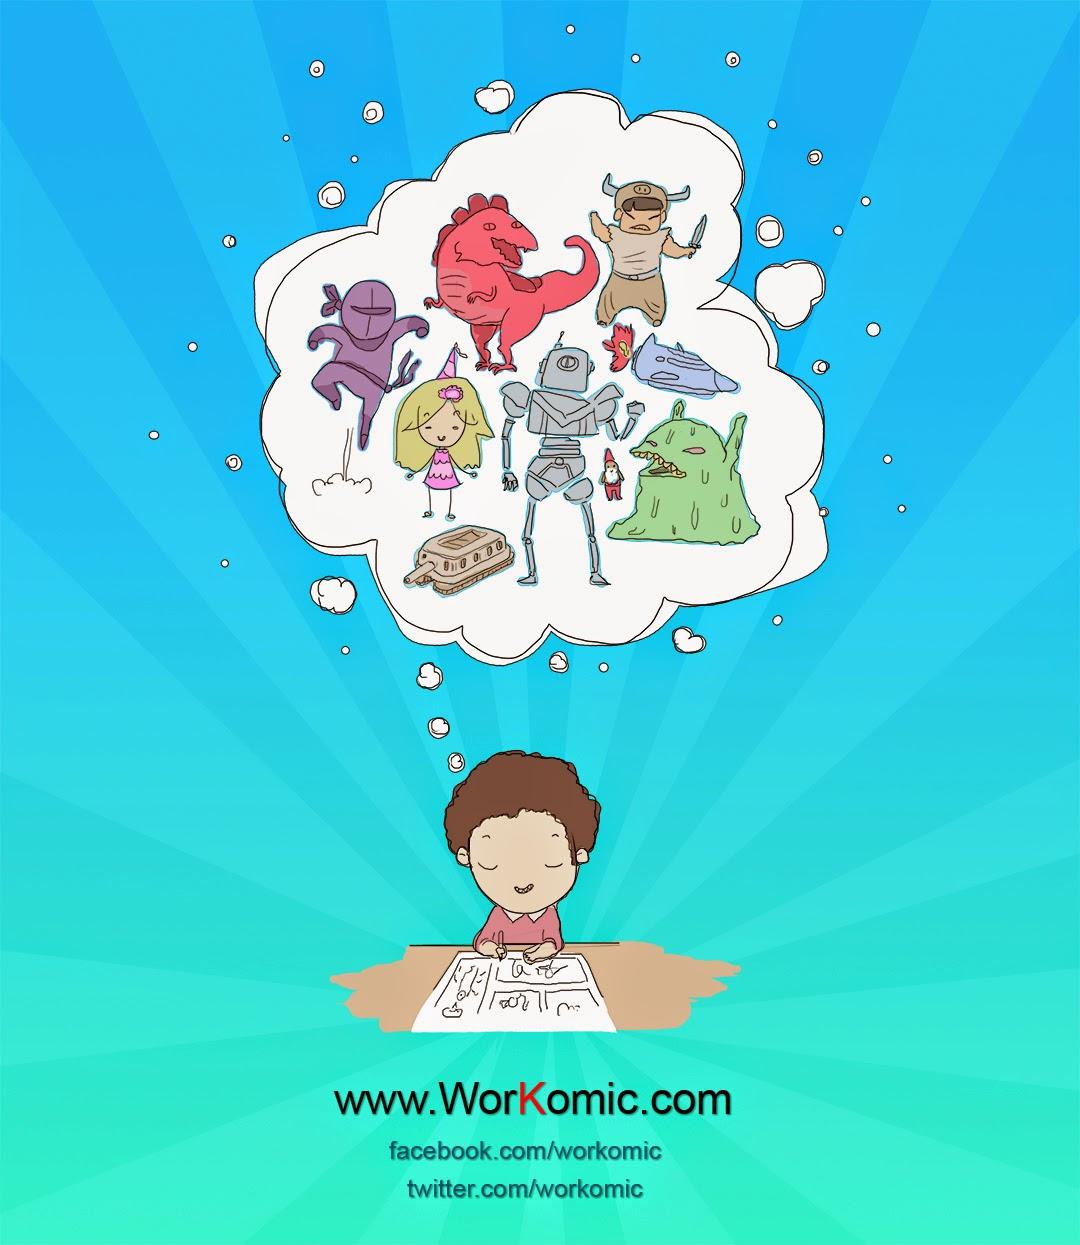 ¡Comparte tu cómic en WorKomic!